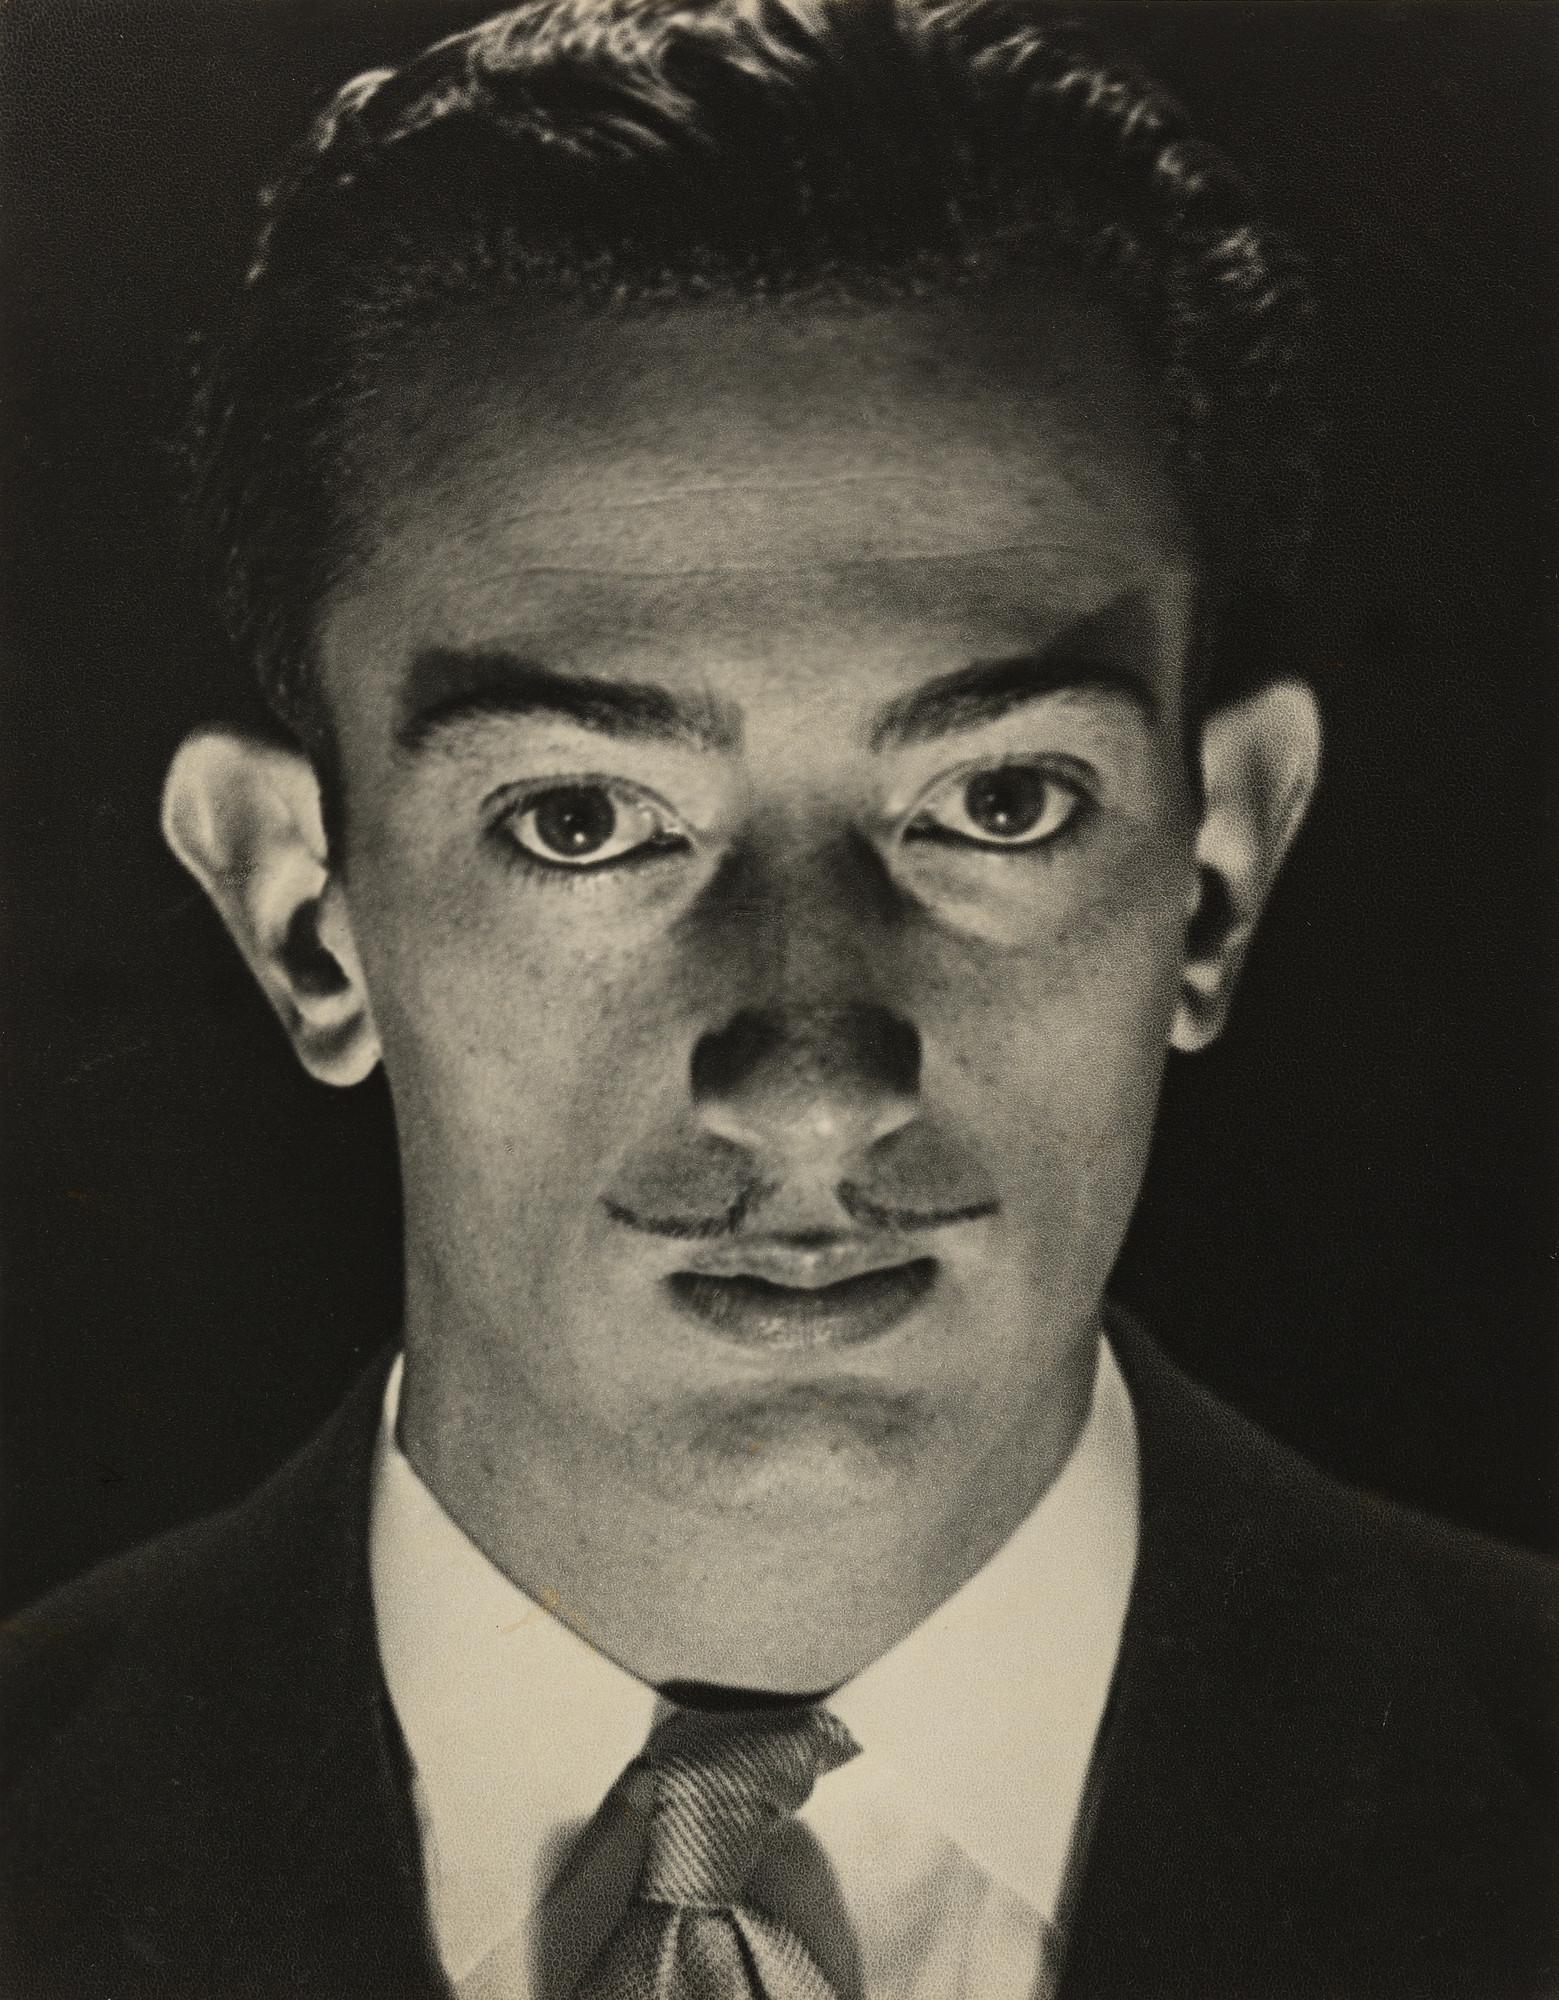 Salvador Dalí | MoMA